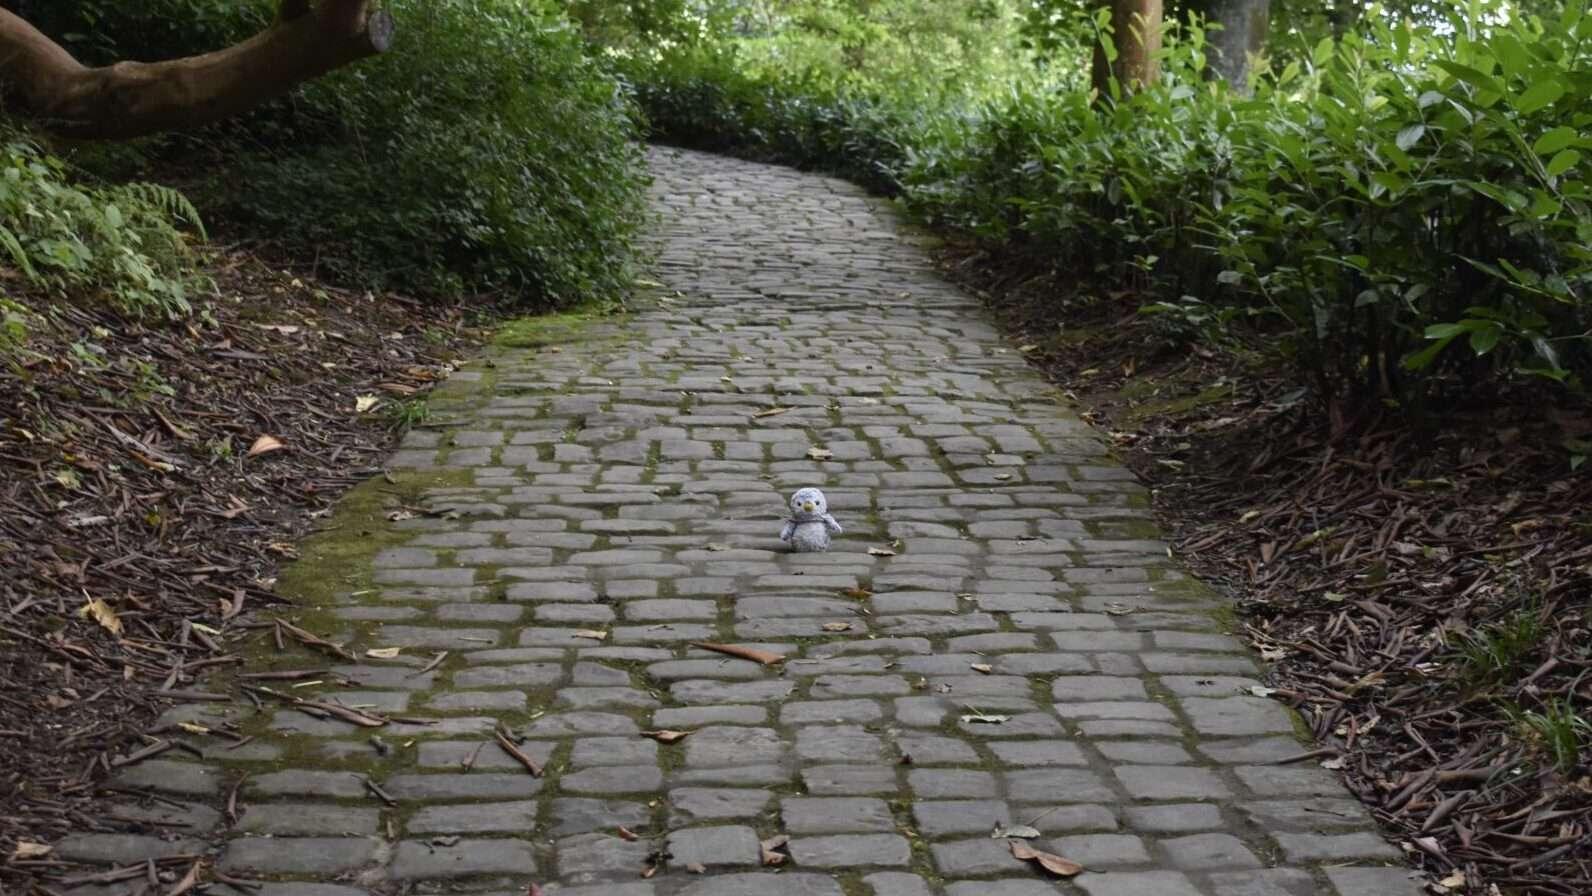 Arnold on pathway